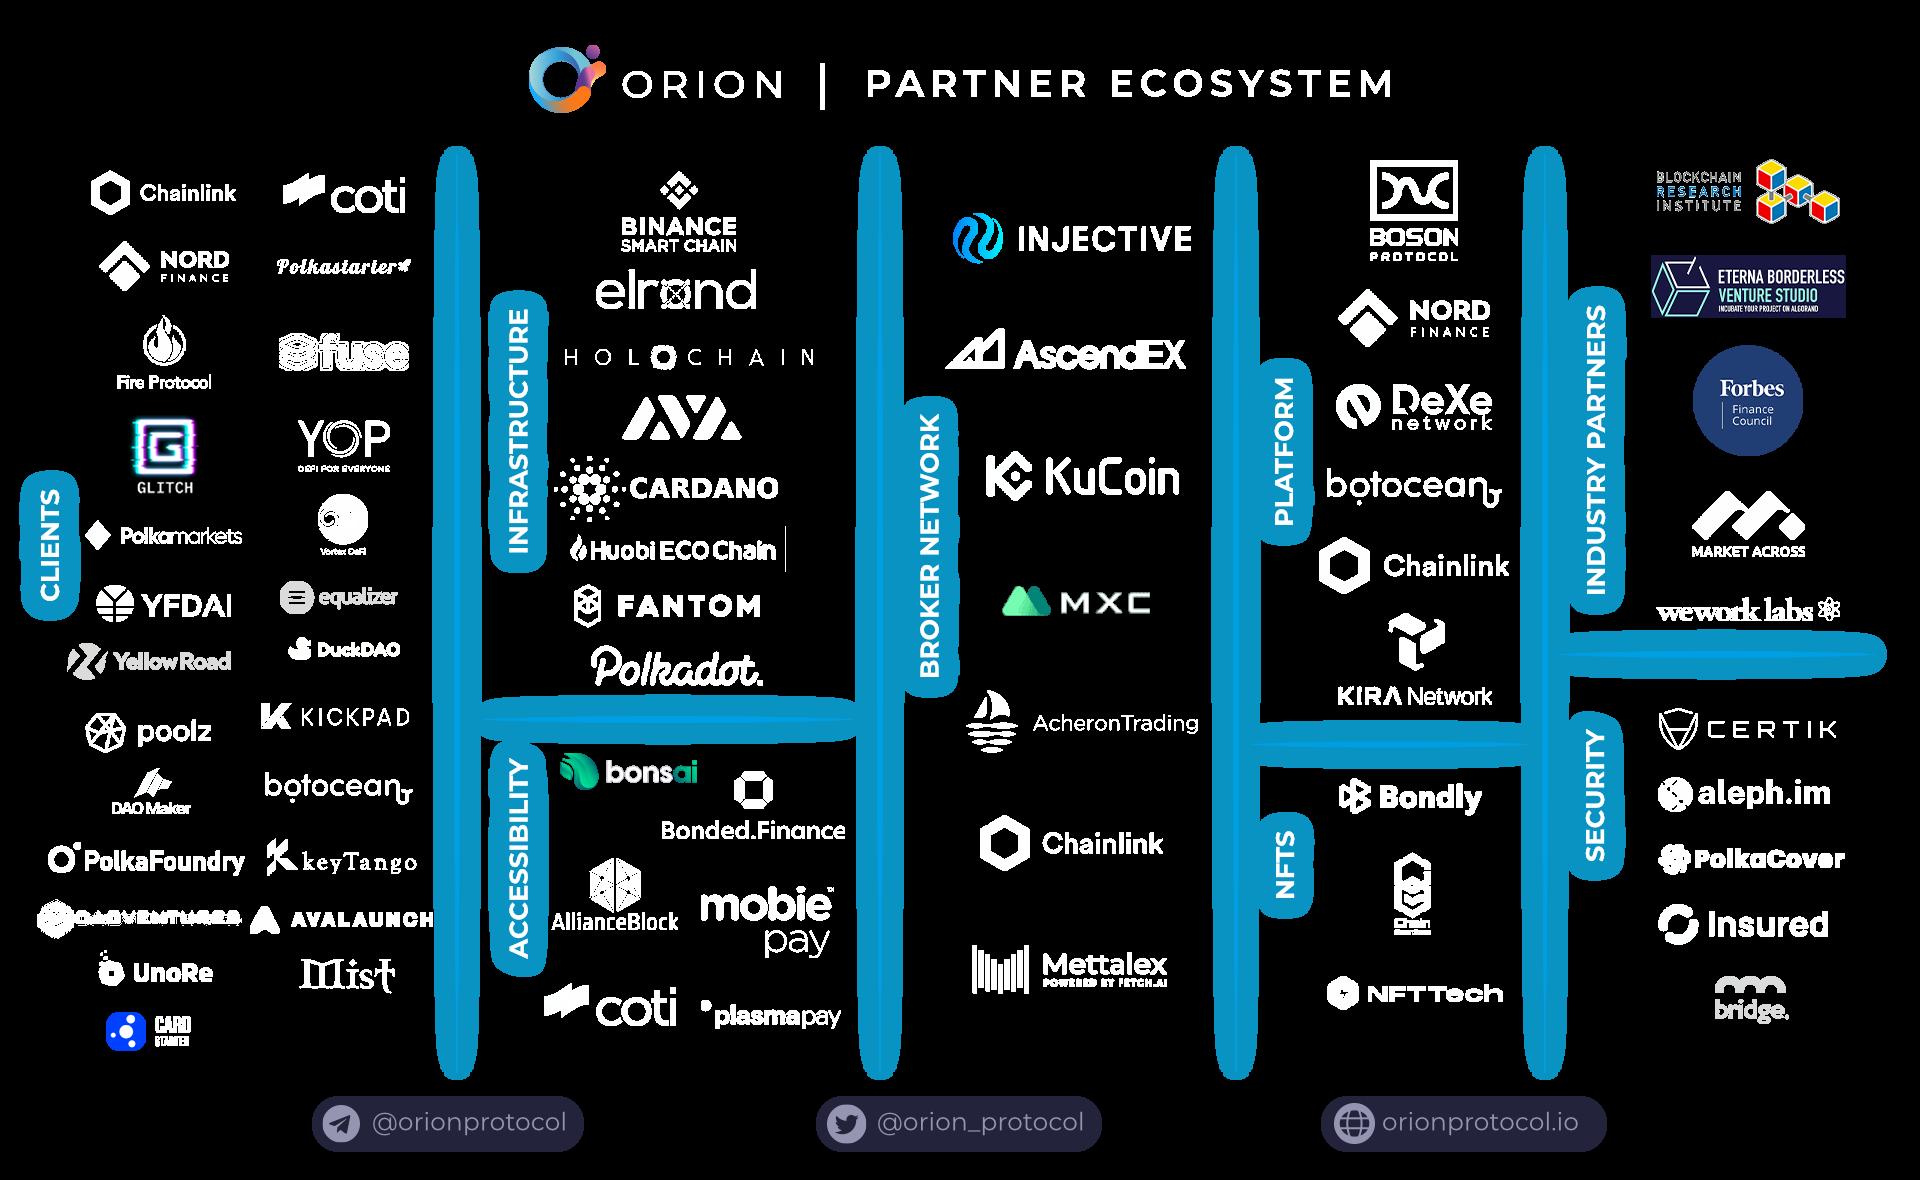 Partnership Ecosystem 14.08.21 clear